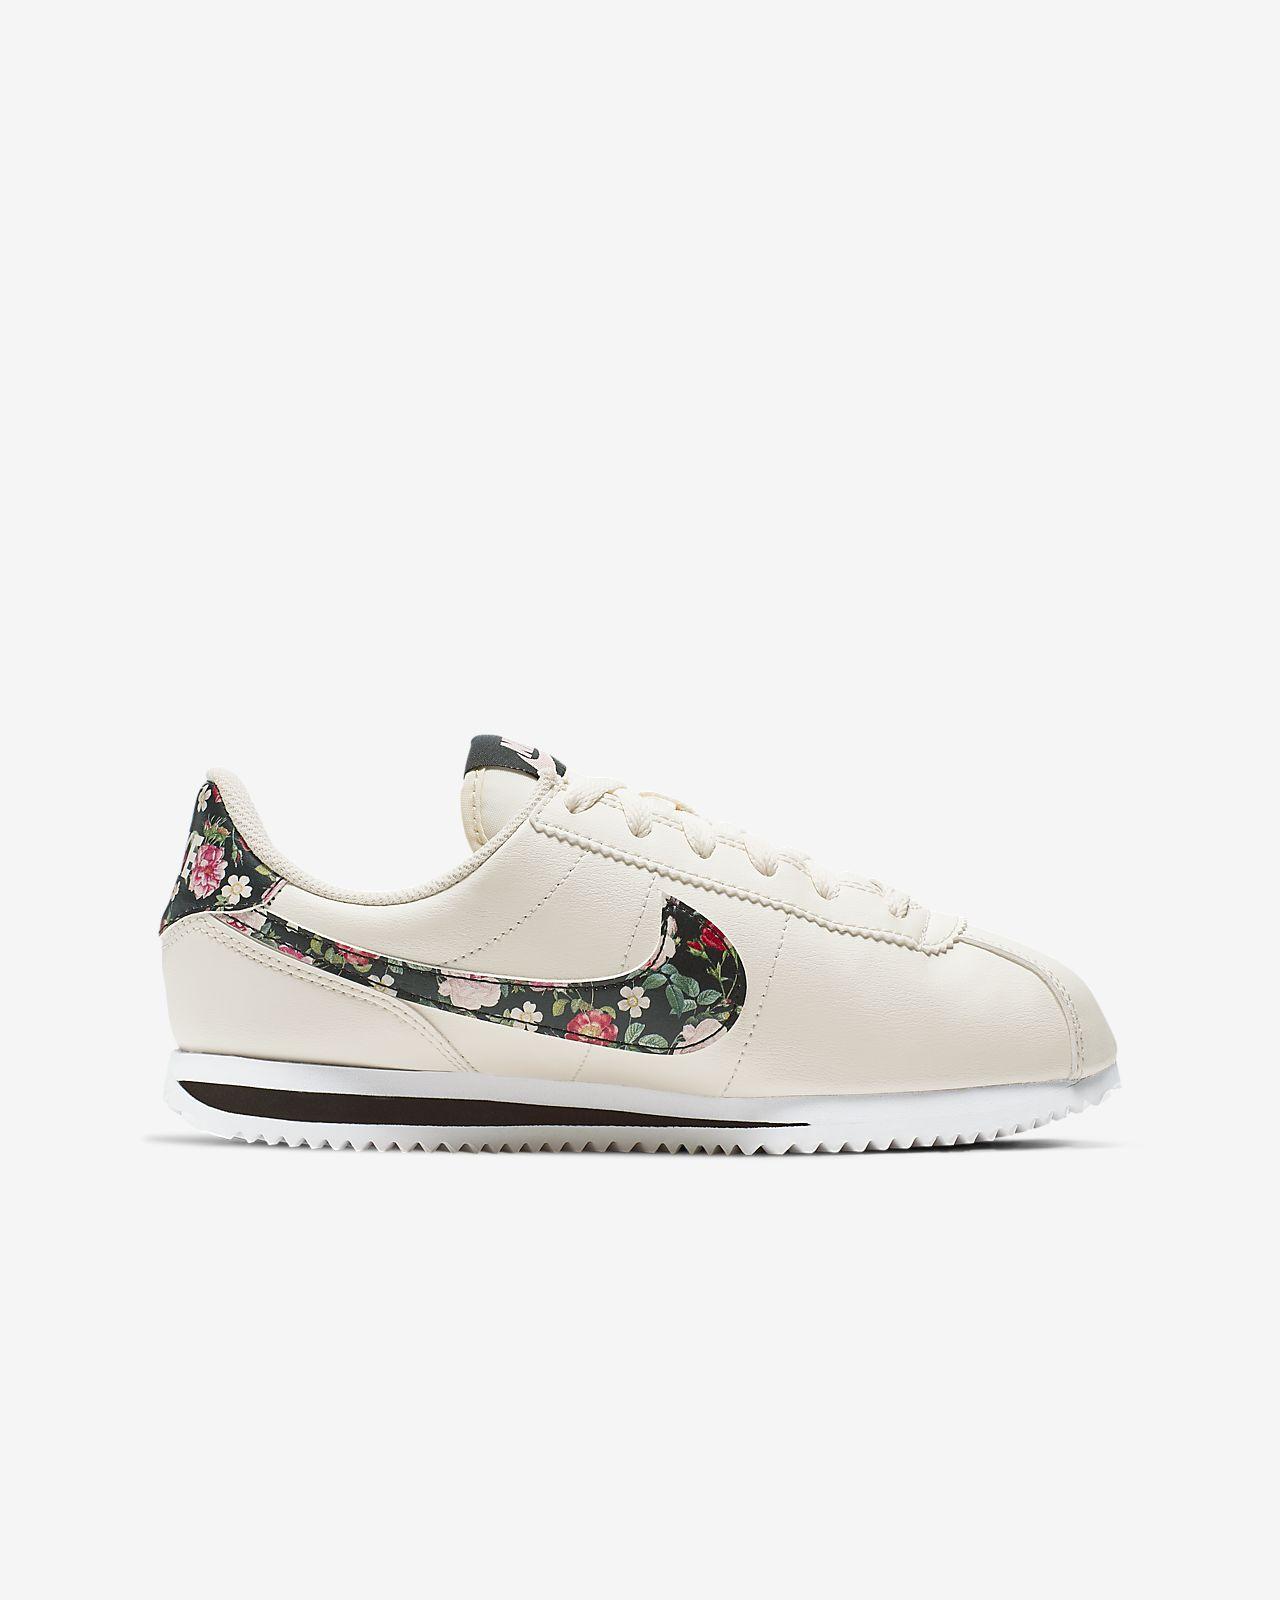 new styles 382b0 5e9a5 Nike Cortez Basic Vintage Floral Older Kids' Shoe